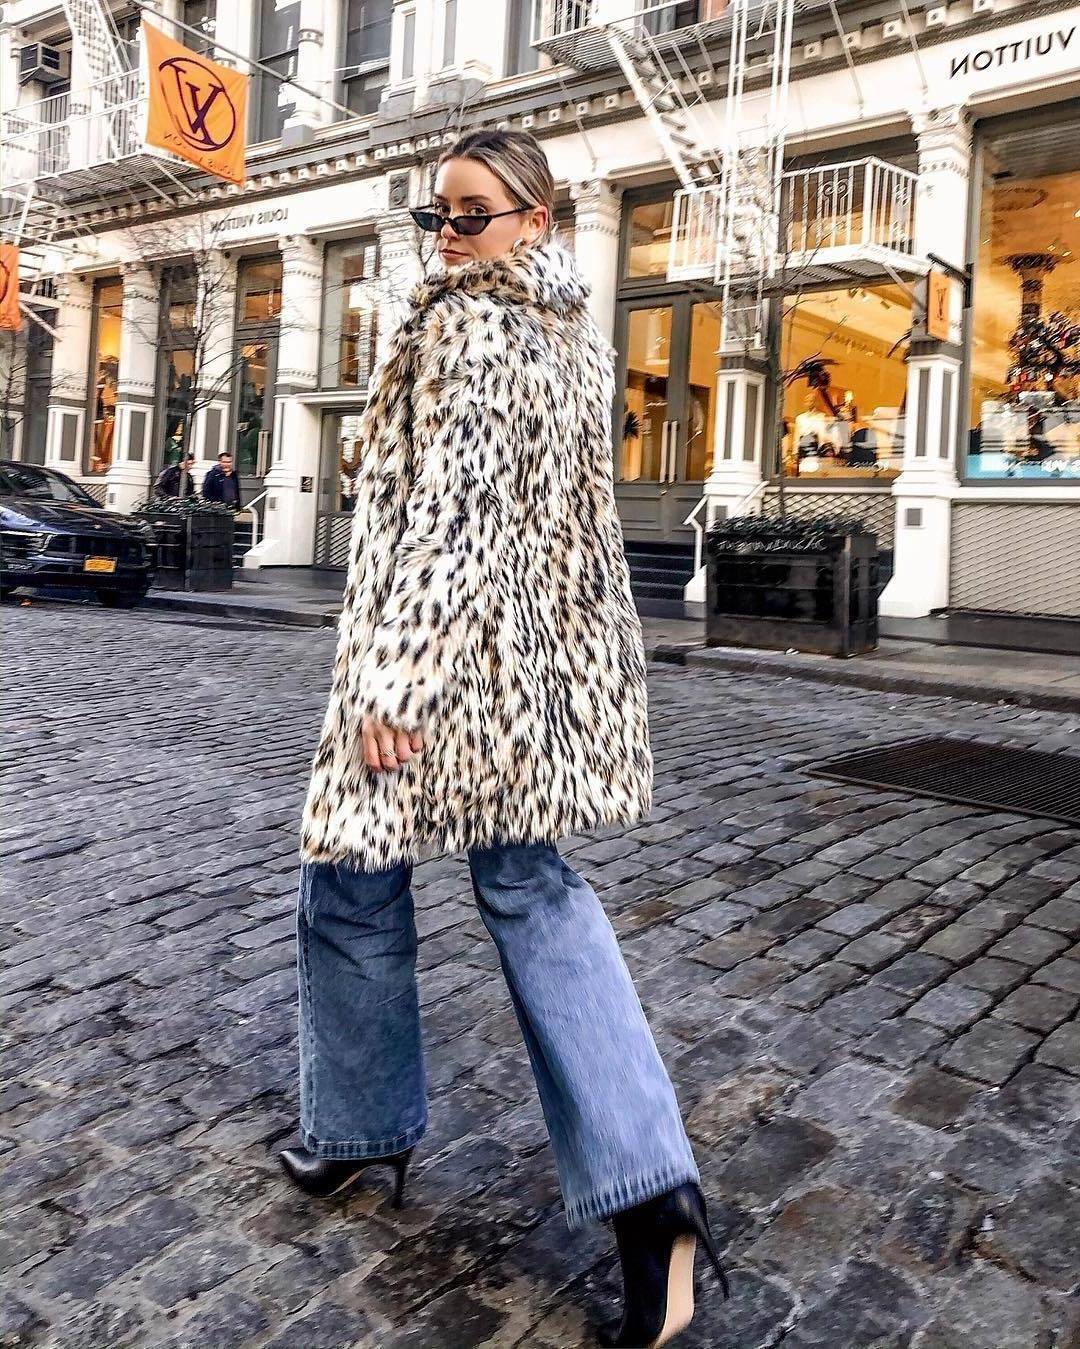 Coat Leopard Coat Fau Fur Coat Leopard Print Flare Jeans Black Boots Winter Outfits Streetstyle Sunglasses cover image